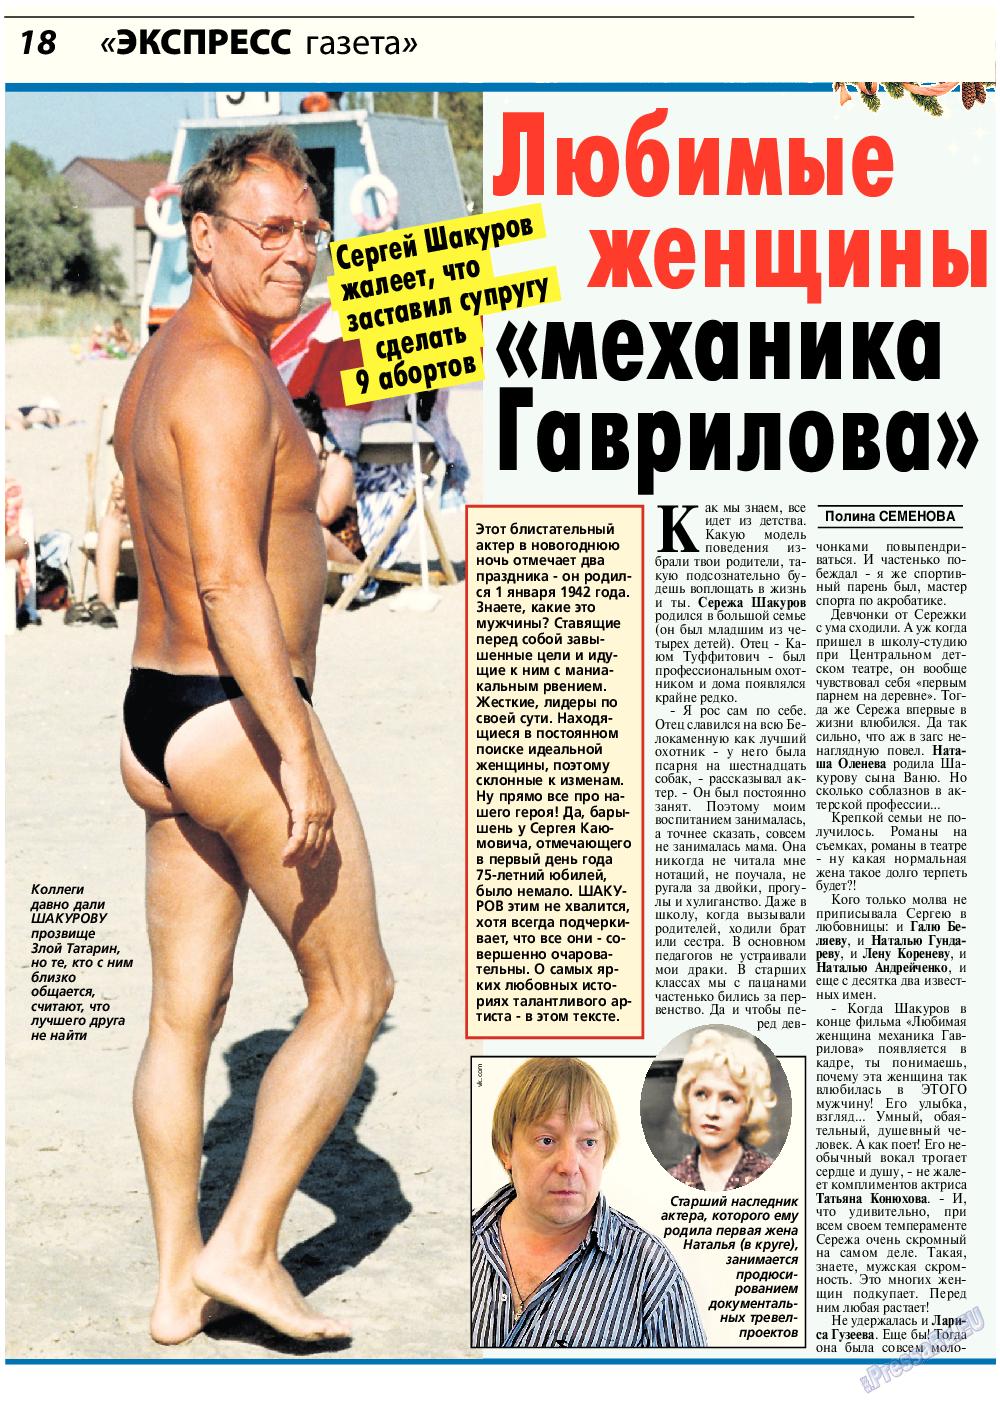 Экспресс газета (газета). 2017 год, номер 2, стр. 18